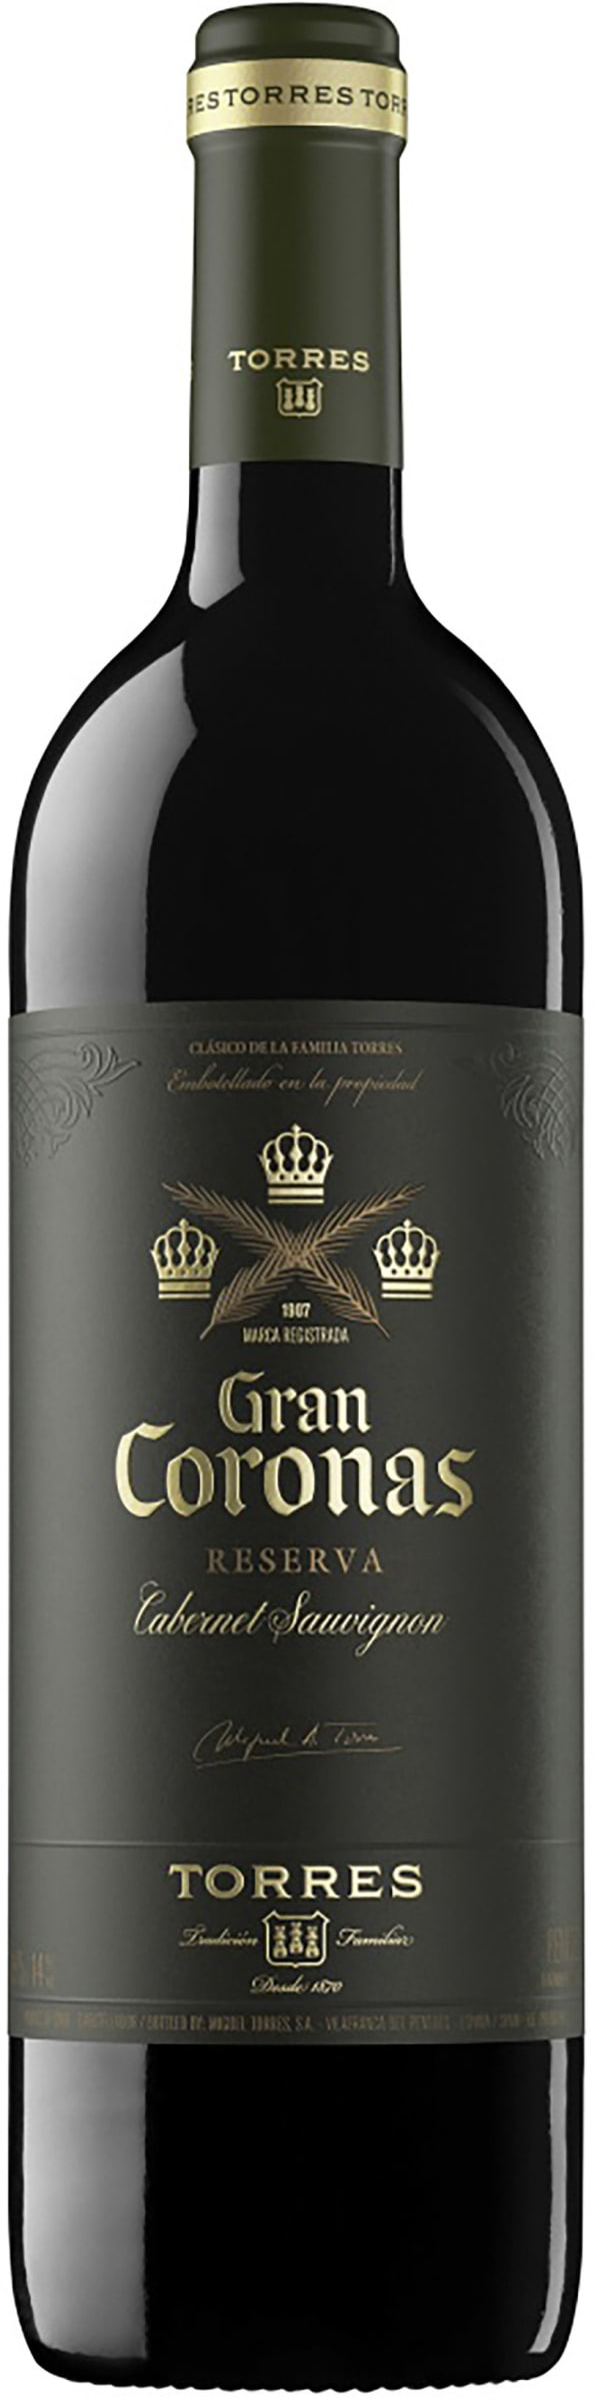 Torres Gran Coronas Cabernet Sauvignon Reserva 2016 gift packaging